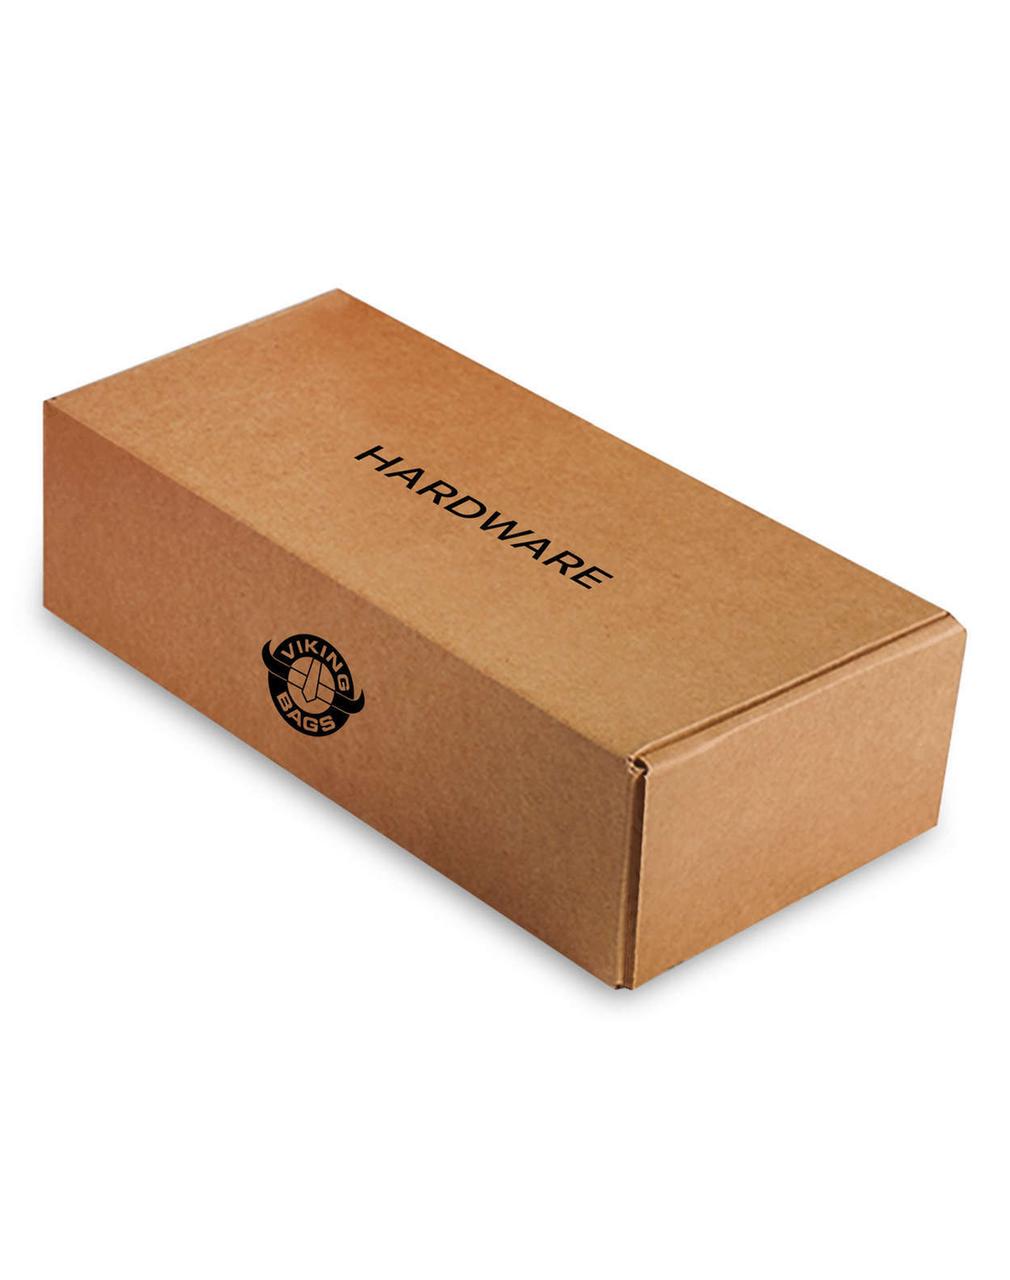 Honda VTX 1300 C Medium Warrior Slanted Motorcycle Saddlebags box